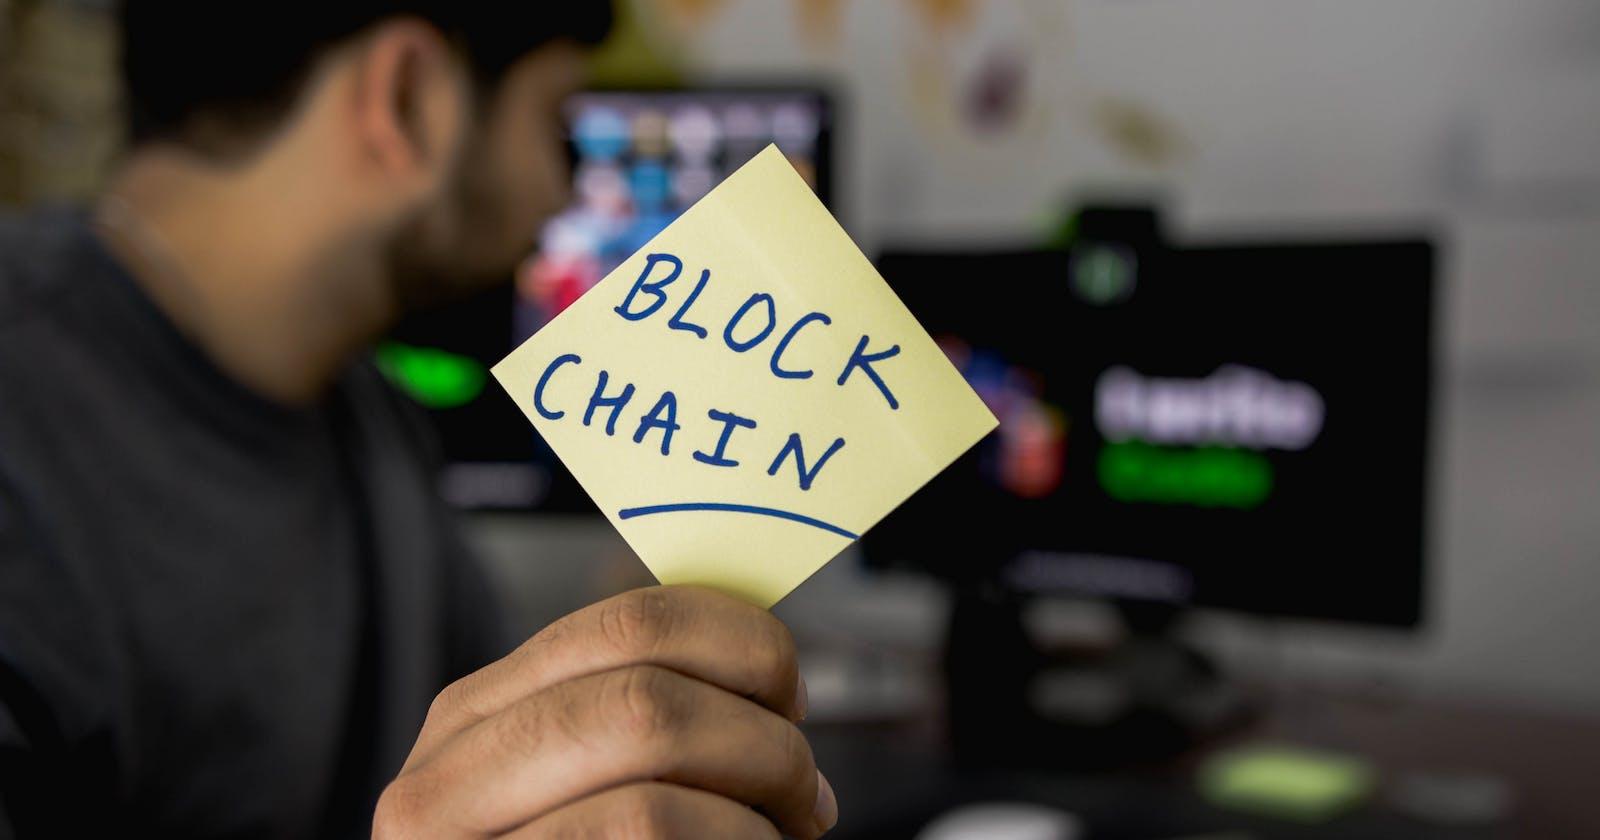 Blockchain Has The Power To Shape 21st Century?